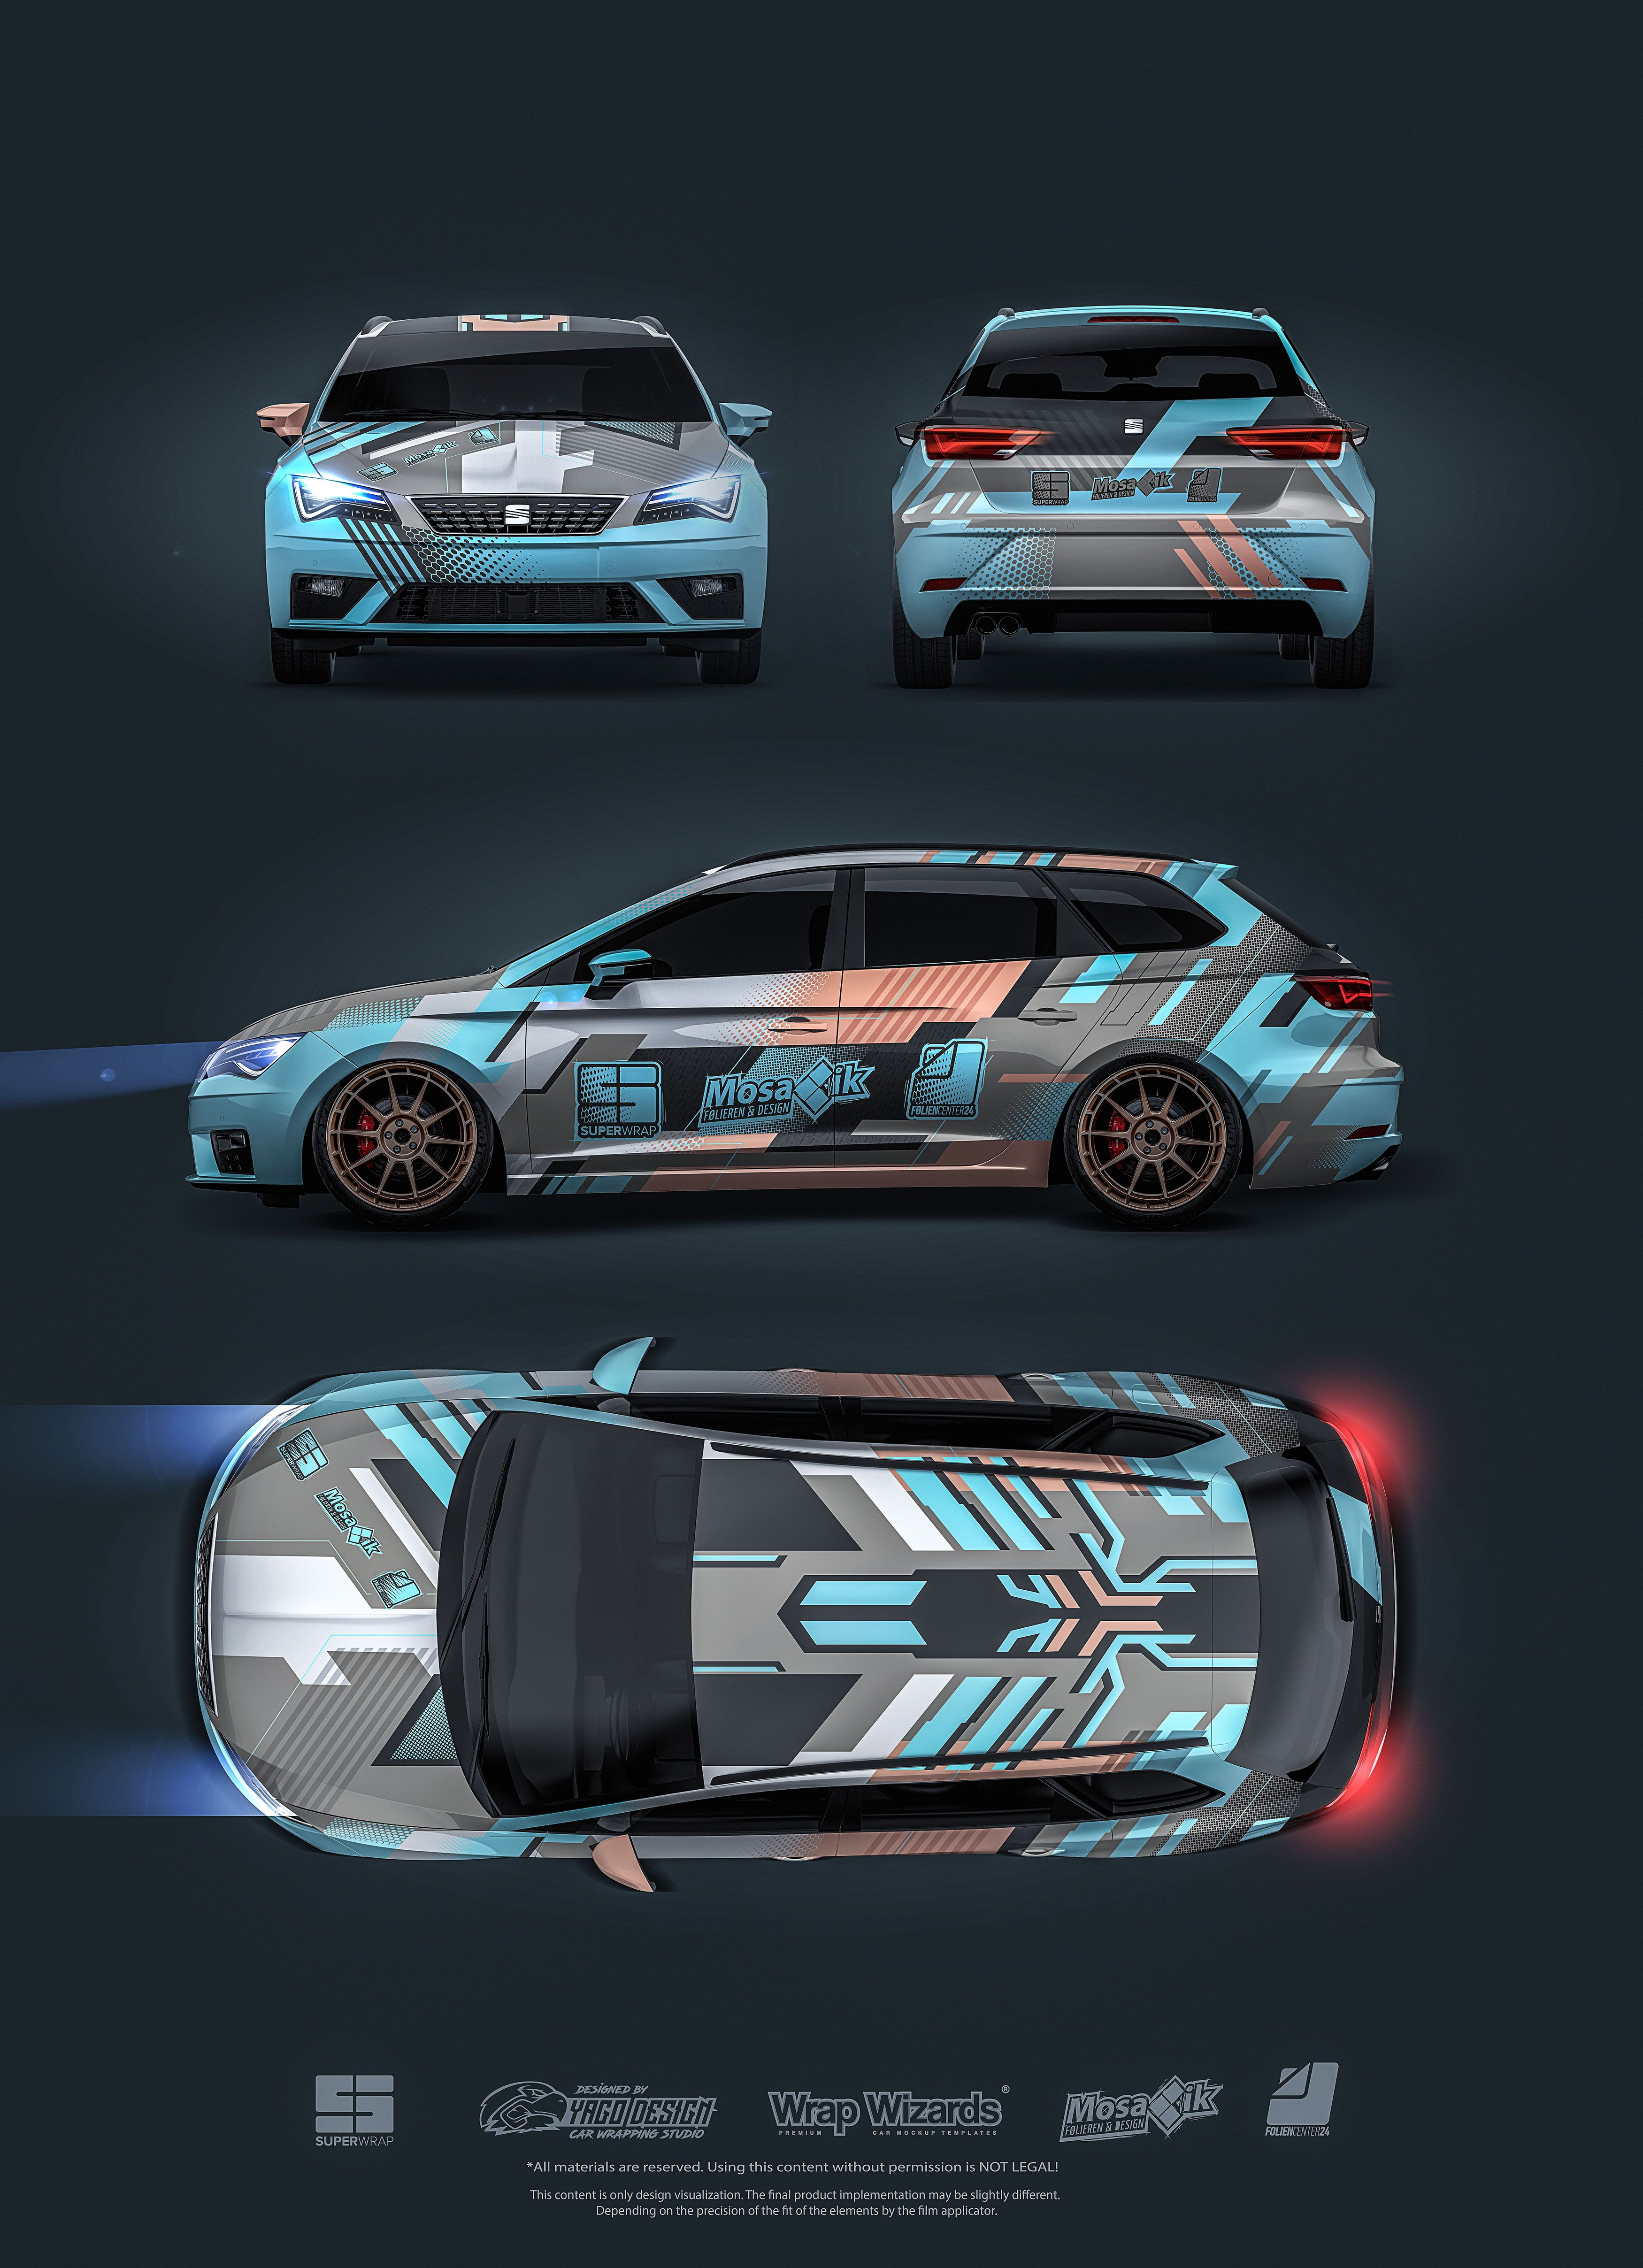 S Seat Leon St S Yago Design Seat Leon Automotive Design Custom Cars [ 4832 x 3500 Pixel ]